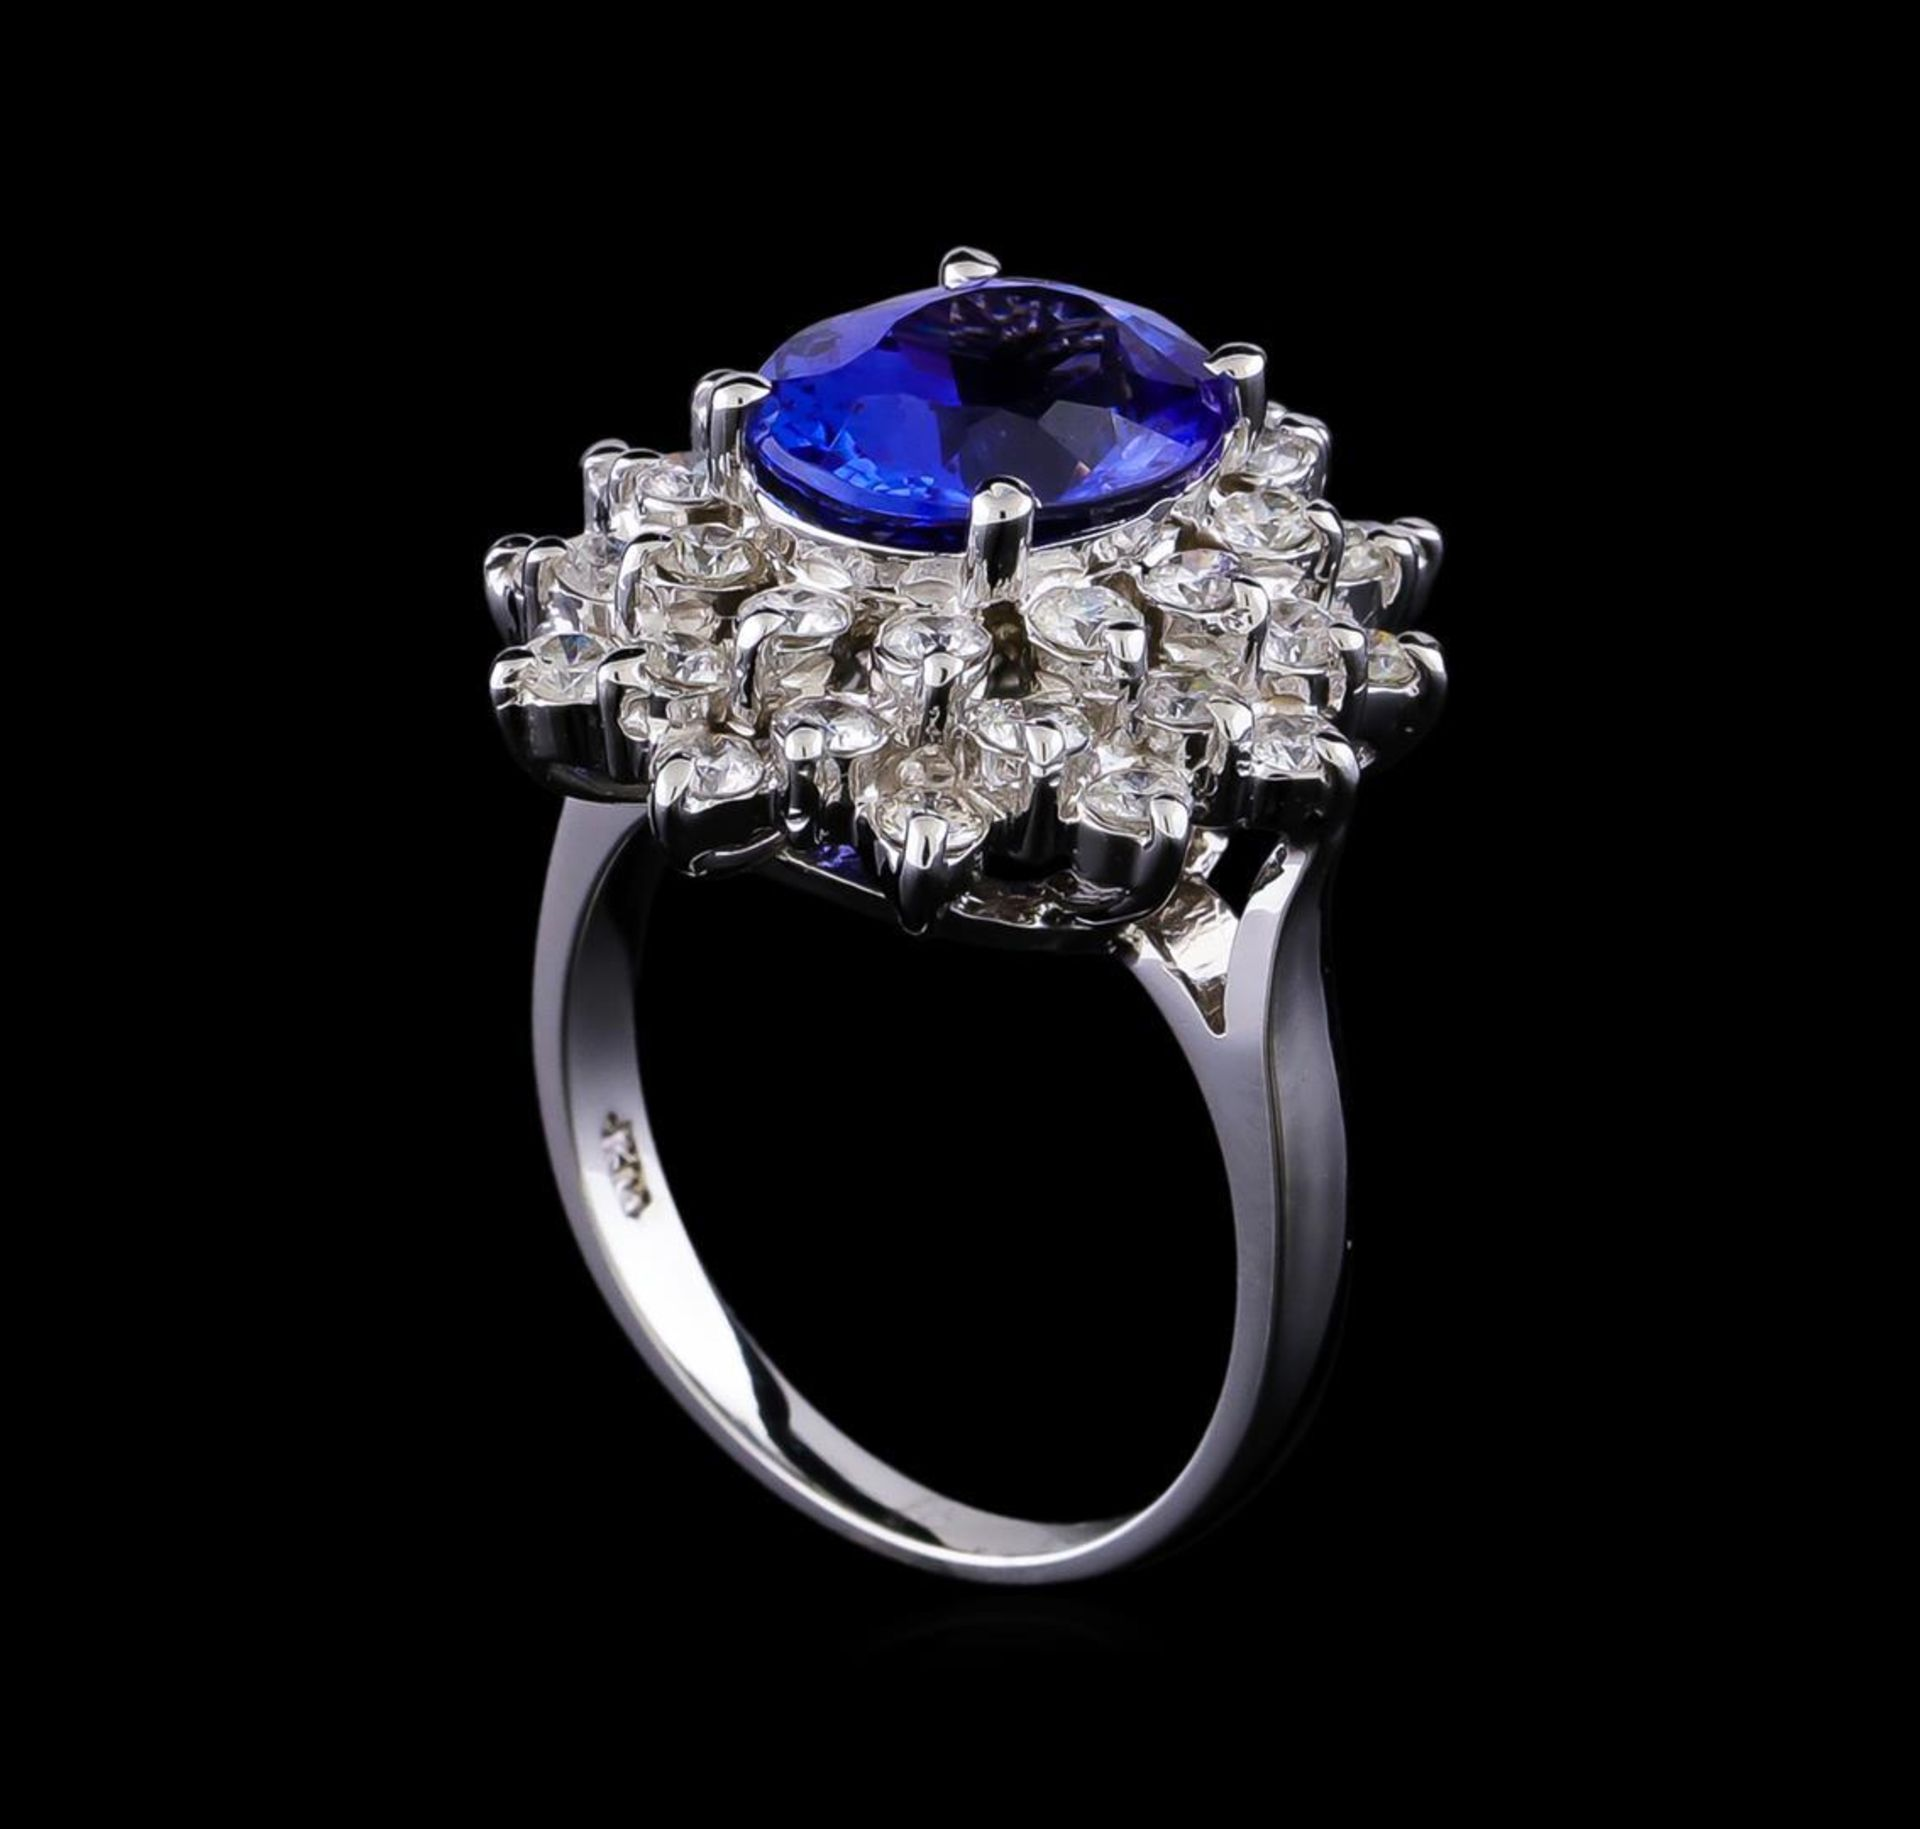 4.01 ctw Tanzanite and Diamond Ring - 14KT White Gold - Image 4 of 5